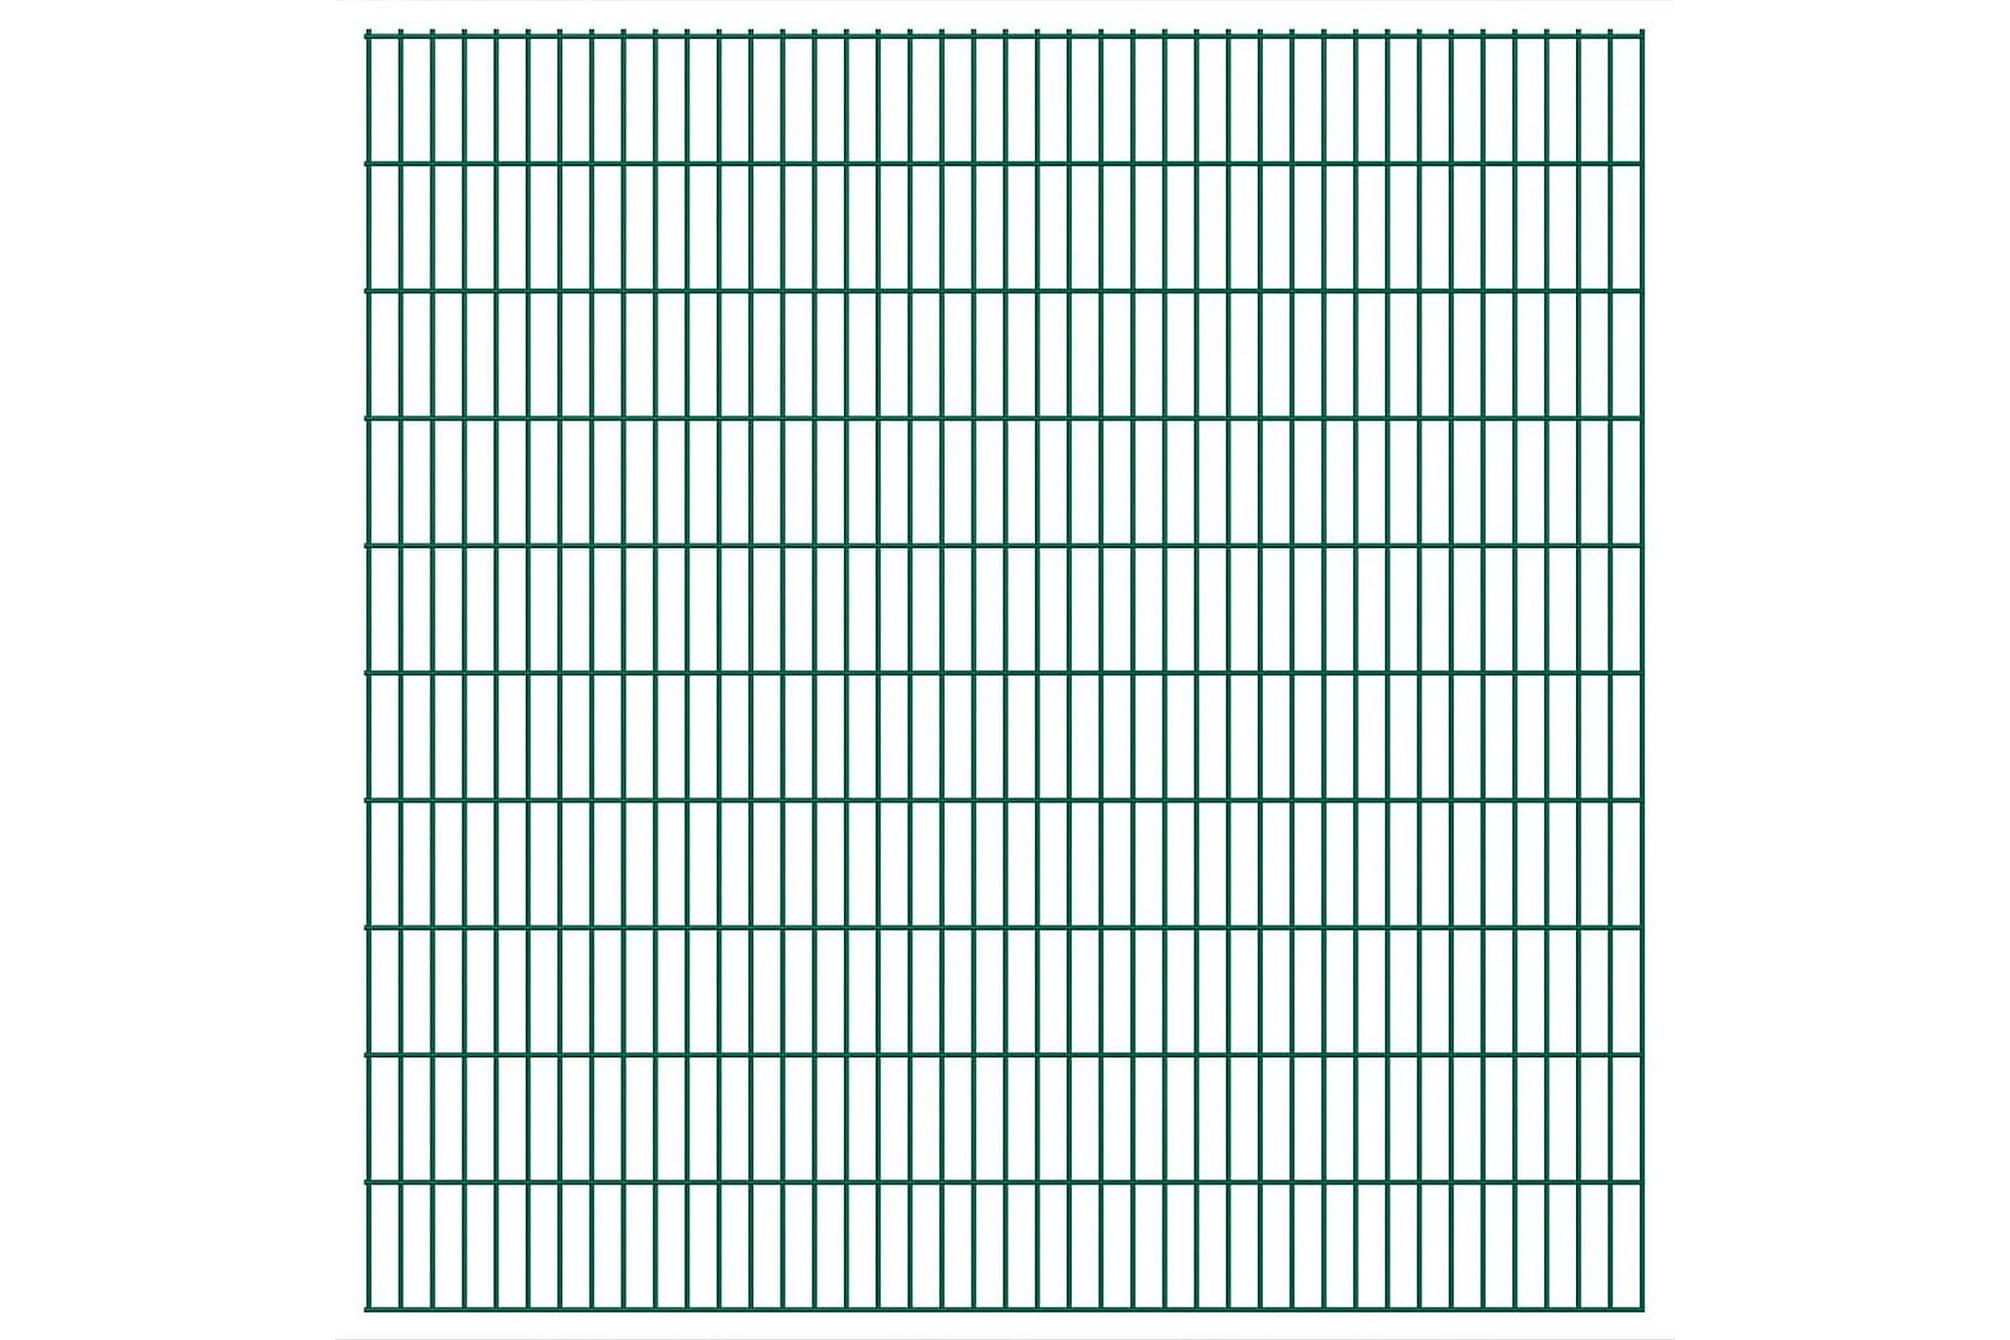 2D Stängselpaneler 2,008x2,03 m grön, Staket & grindar